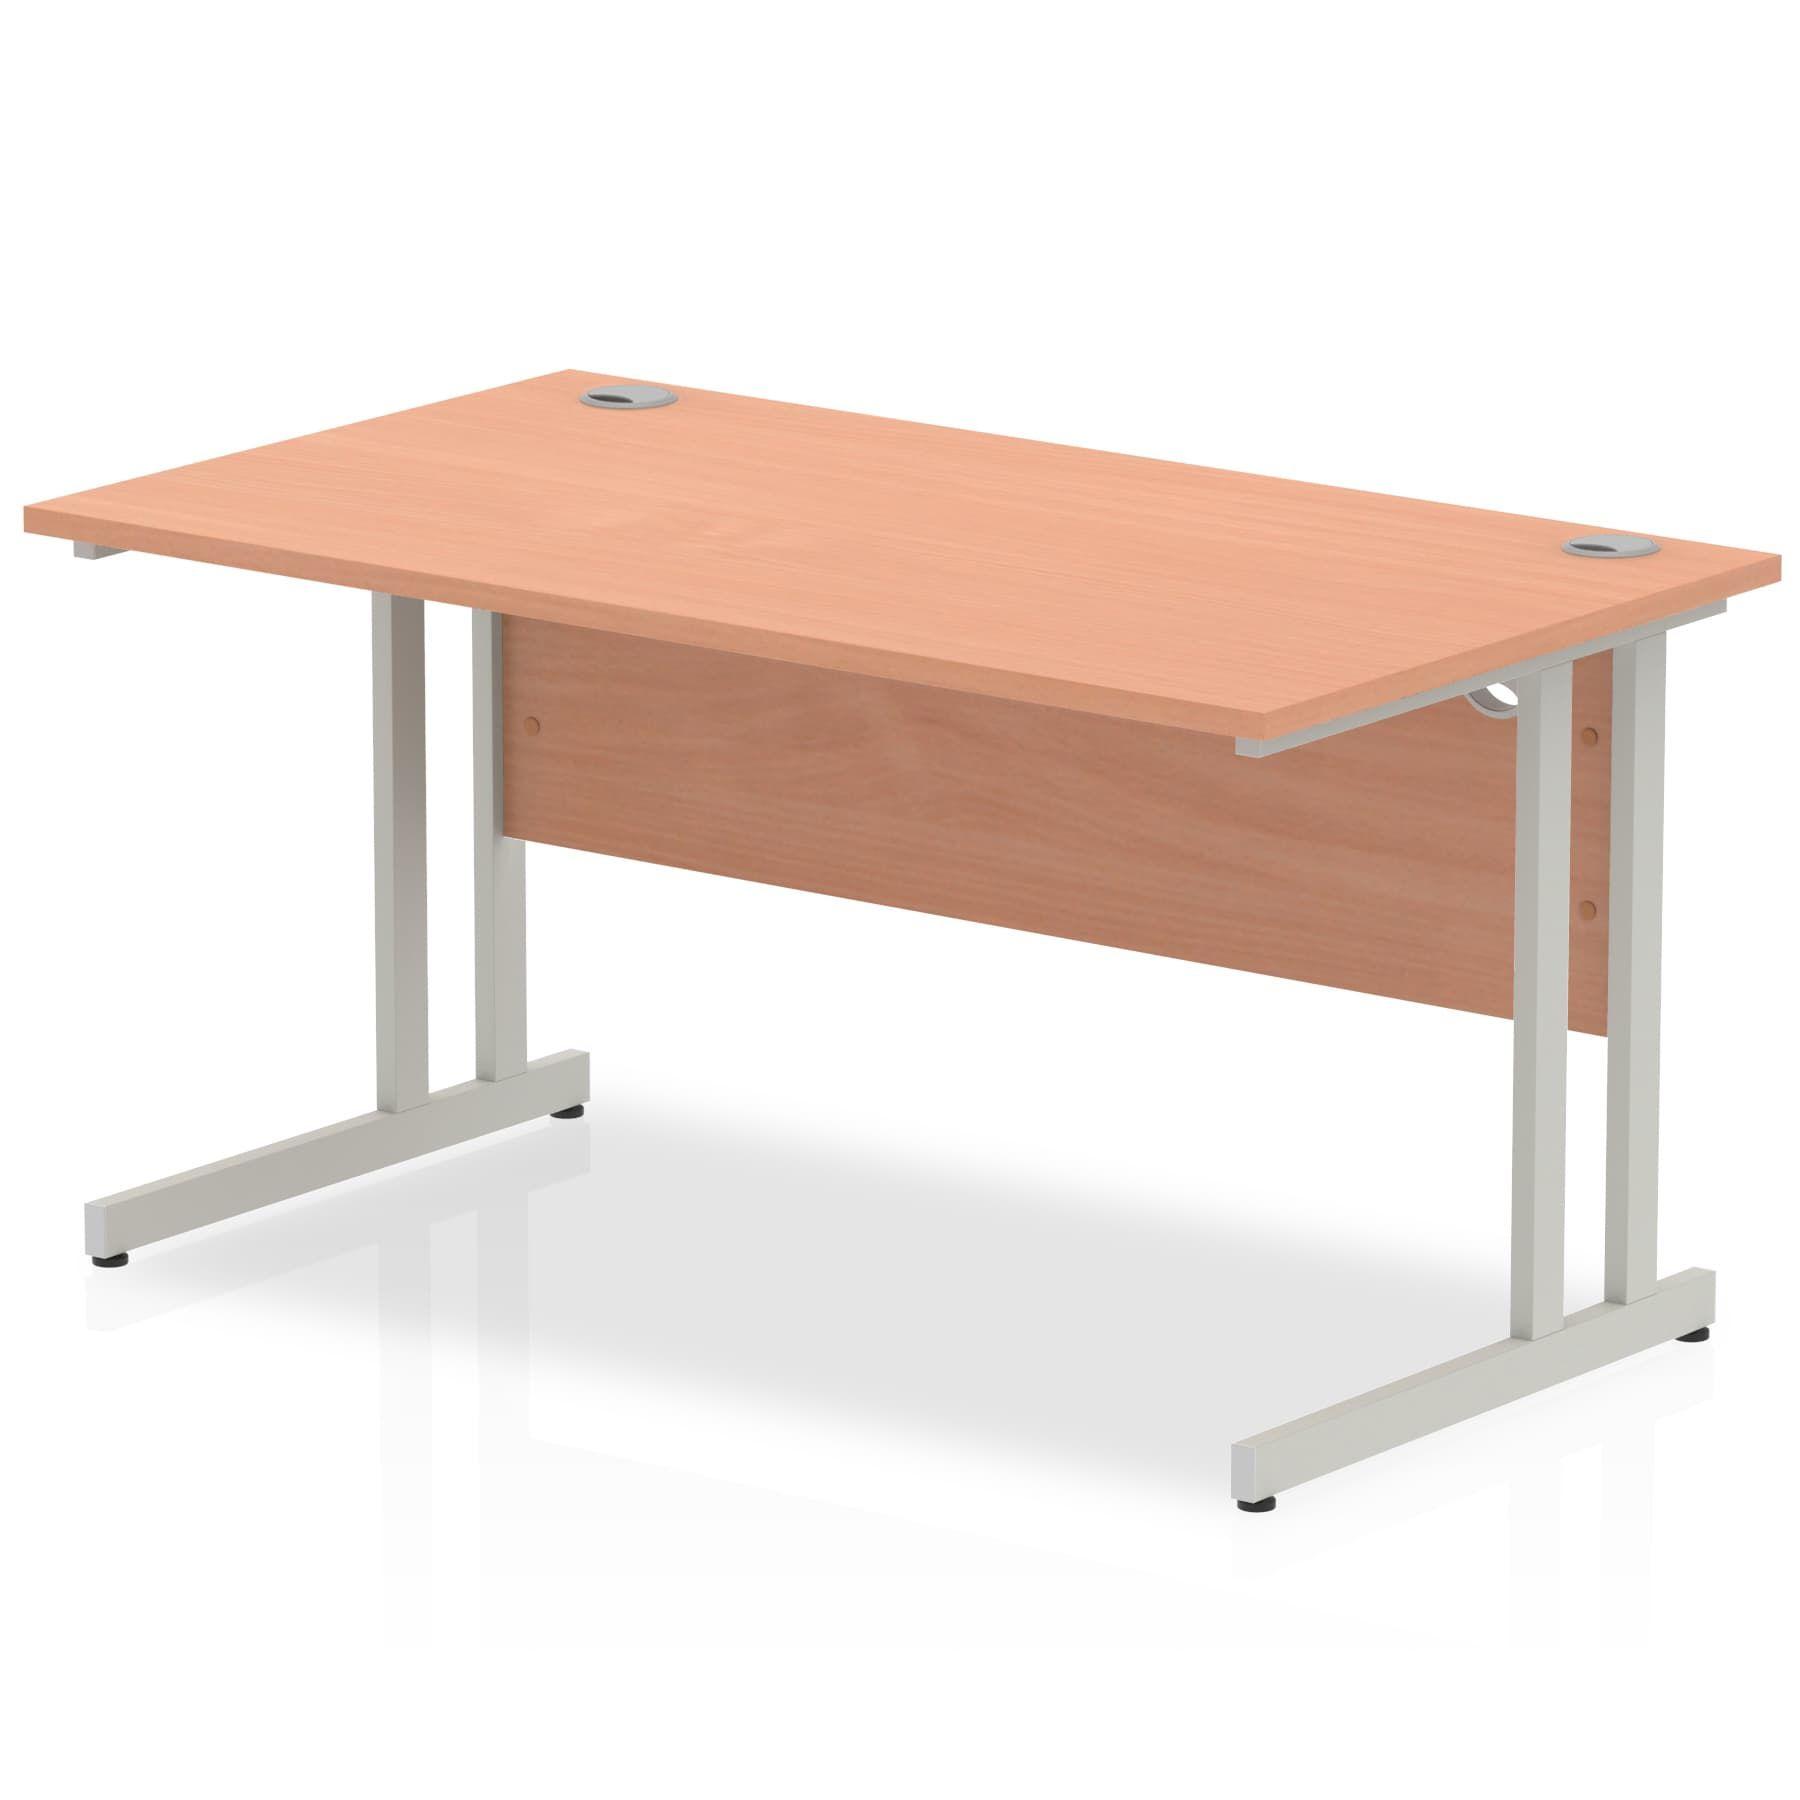 Impulse Cantilever 1400 Rectangle Desk